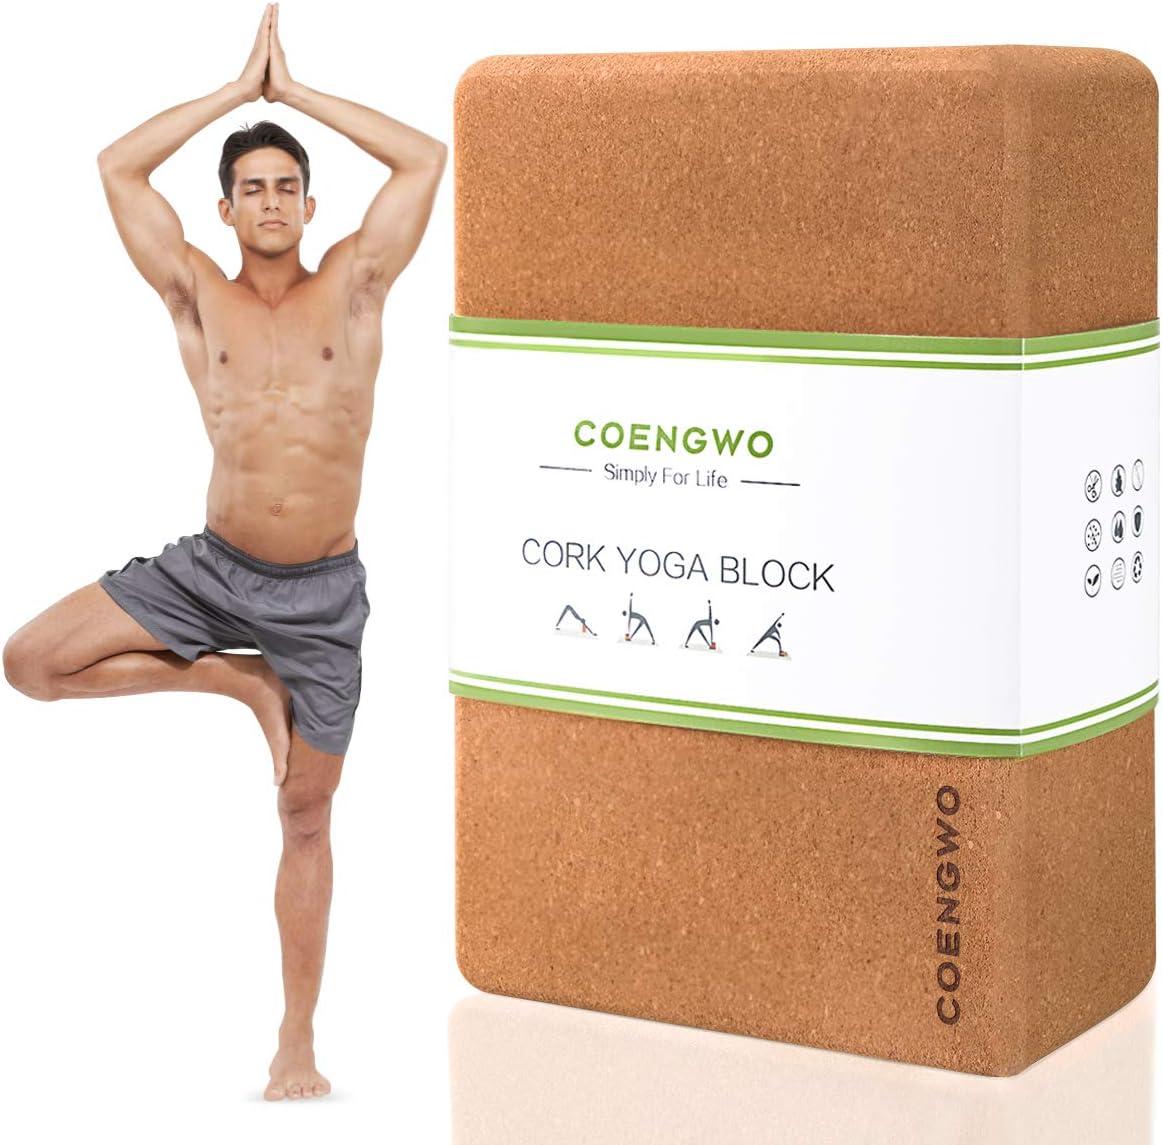 Amazon Com Coengwo Cork Yoga Block Yoga Brick Cork Yoga Exercise Block Set Non Slip Eco Yoga Cork Block To Support And Deepen Poses For Yoga Pilates Meditation 1 Block 9 X